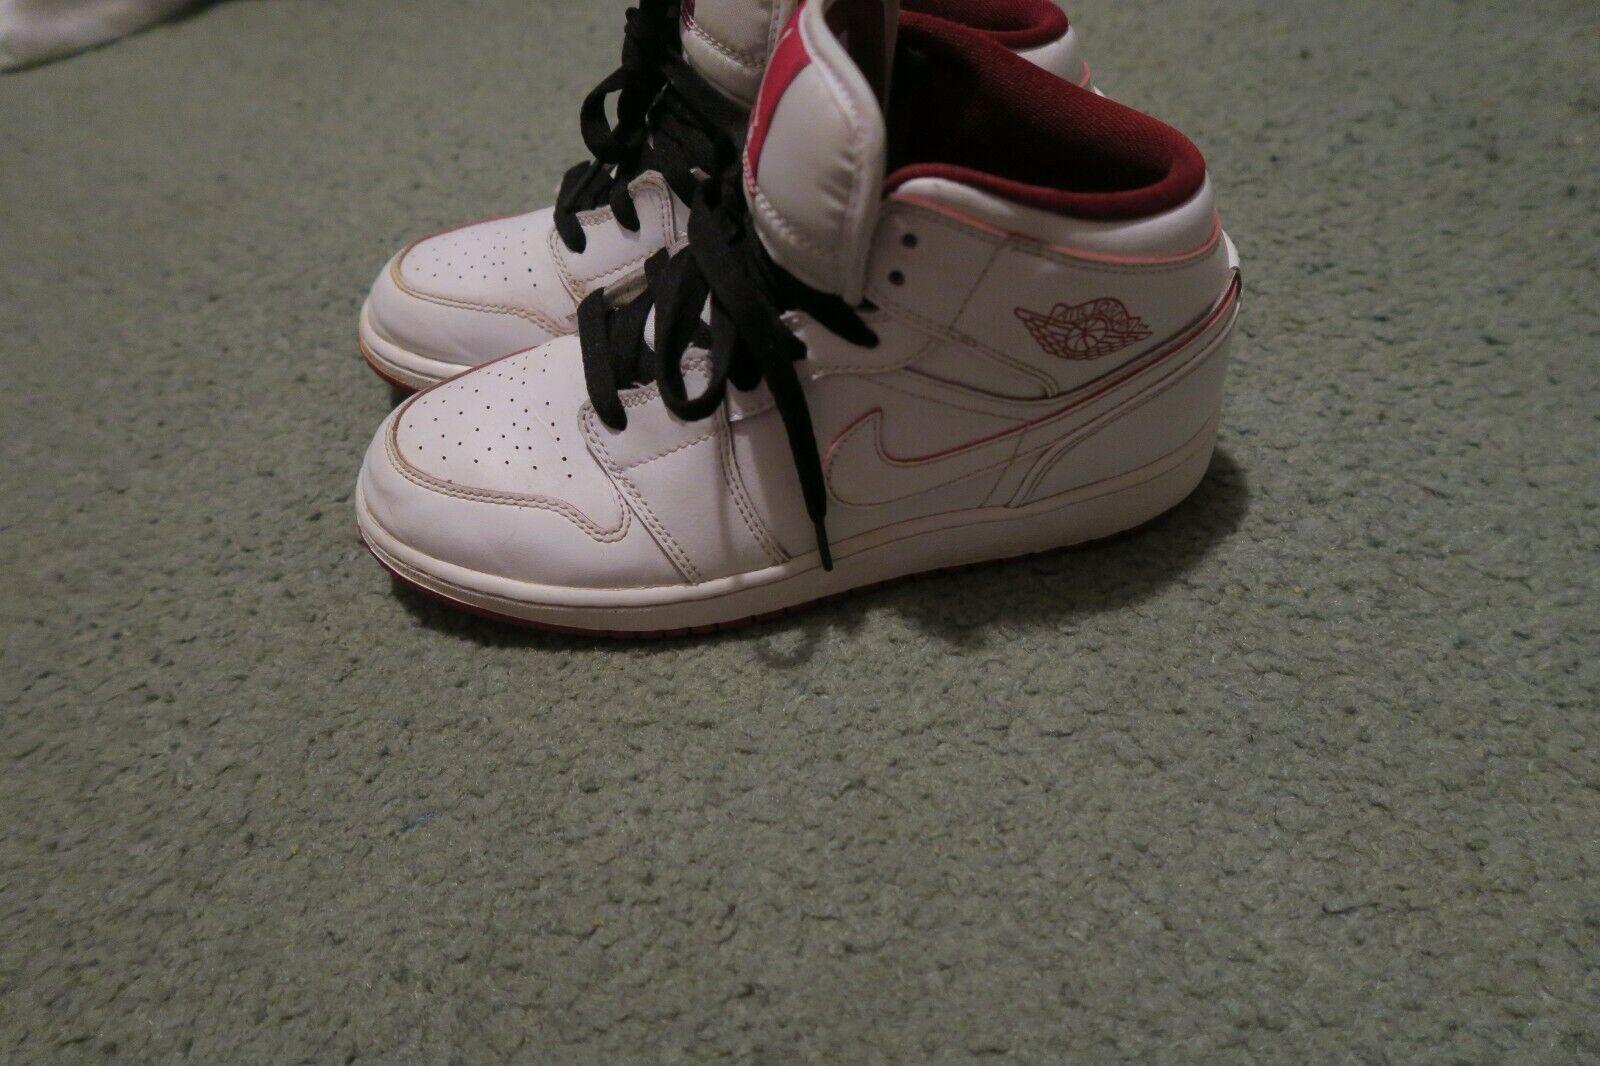 Air Jordan Retro 1 Mid White Gym Red